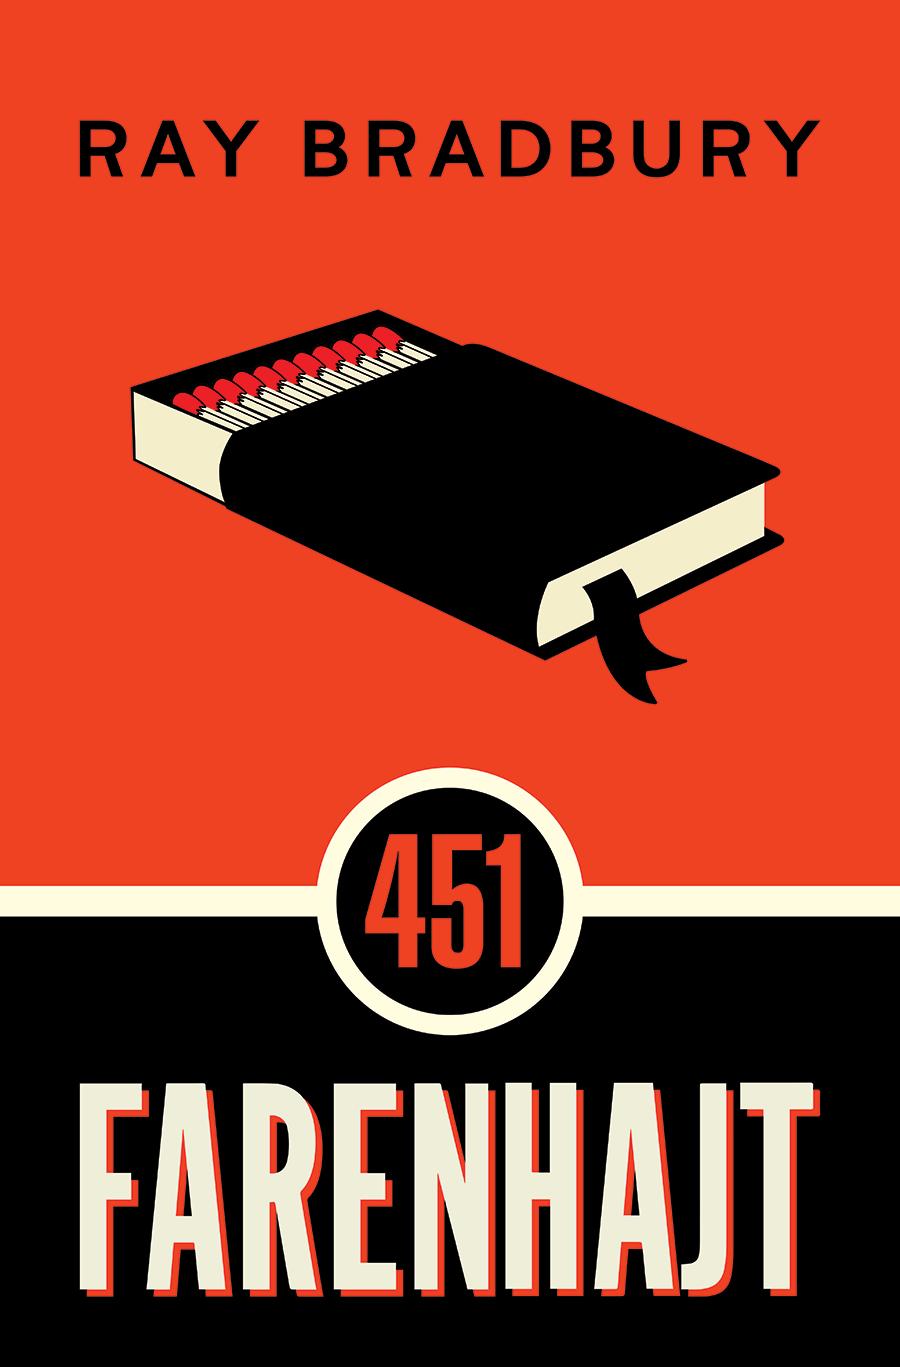 451 Farenhajt